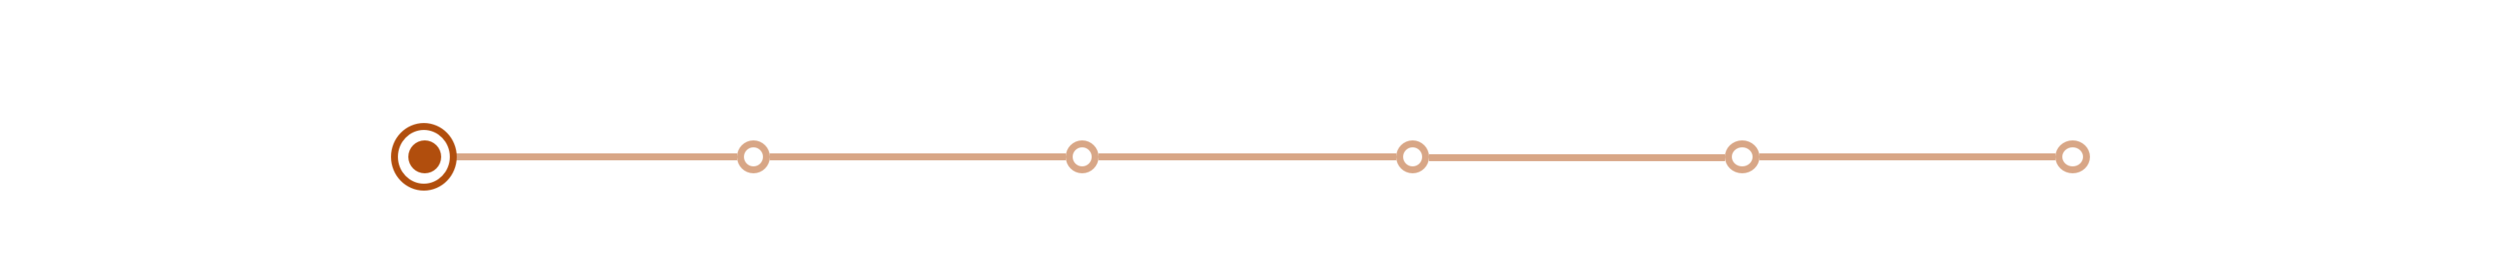 progressbar_1.png